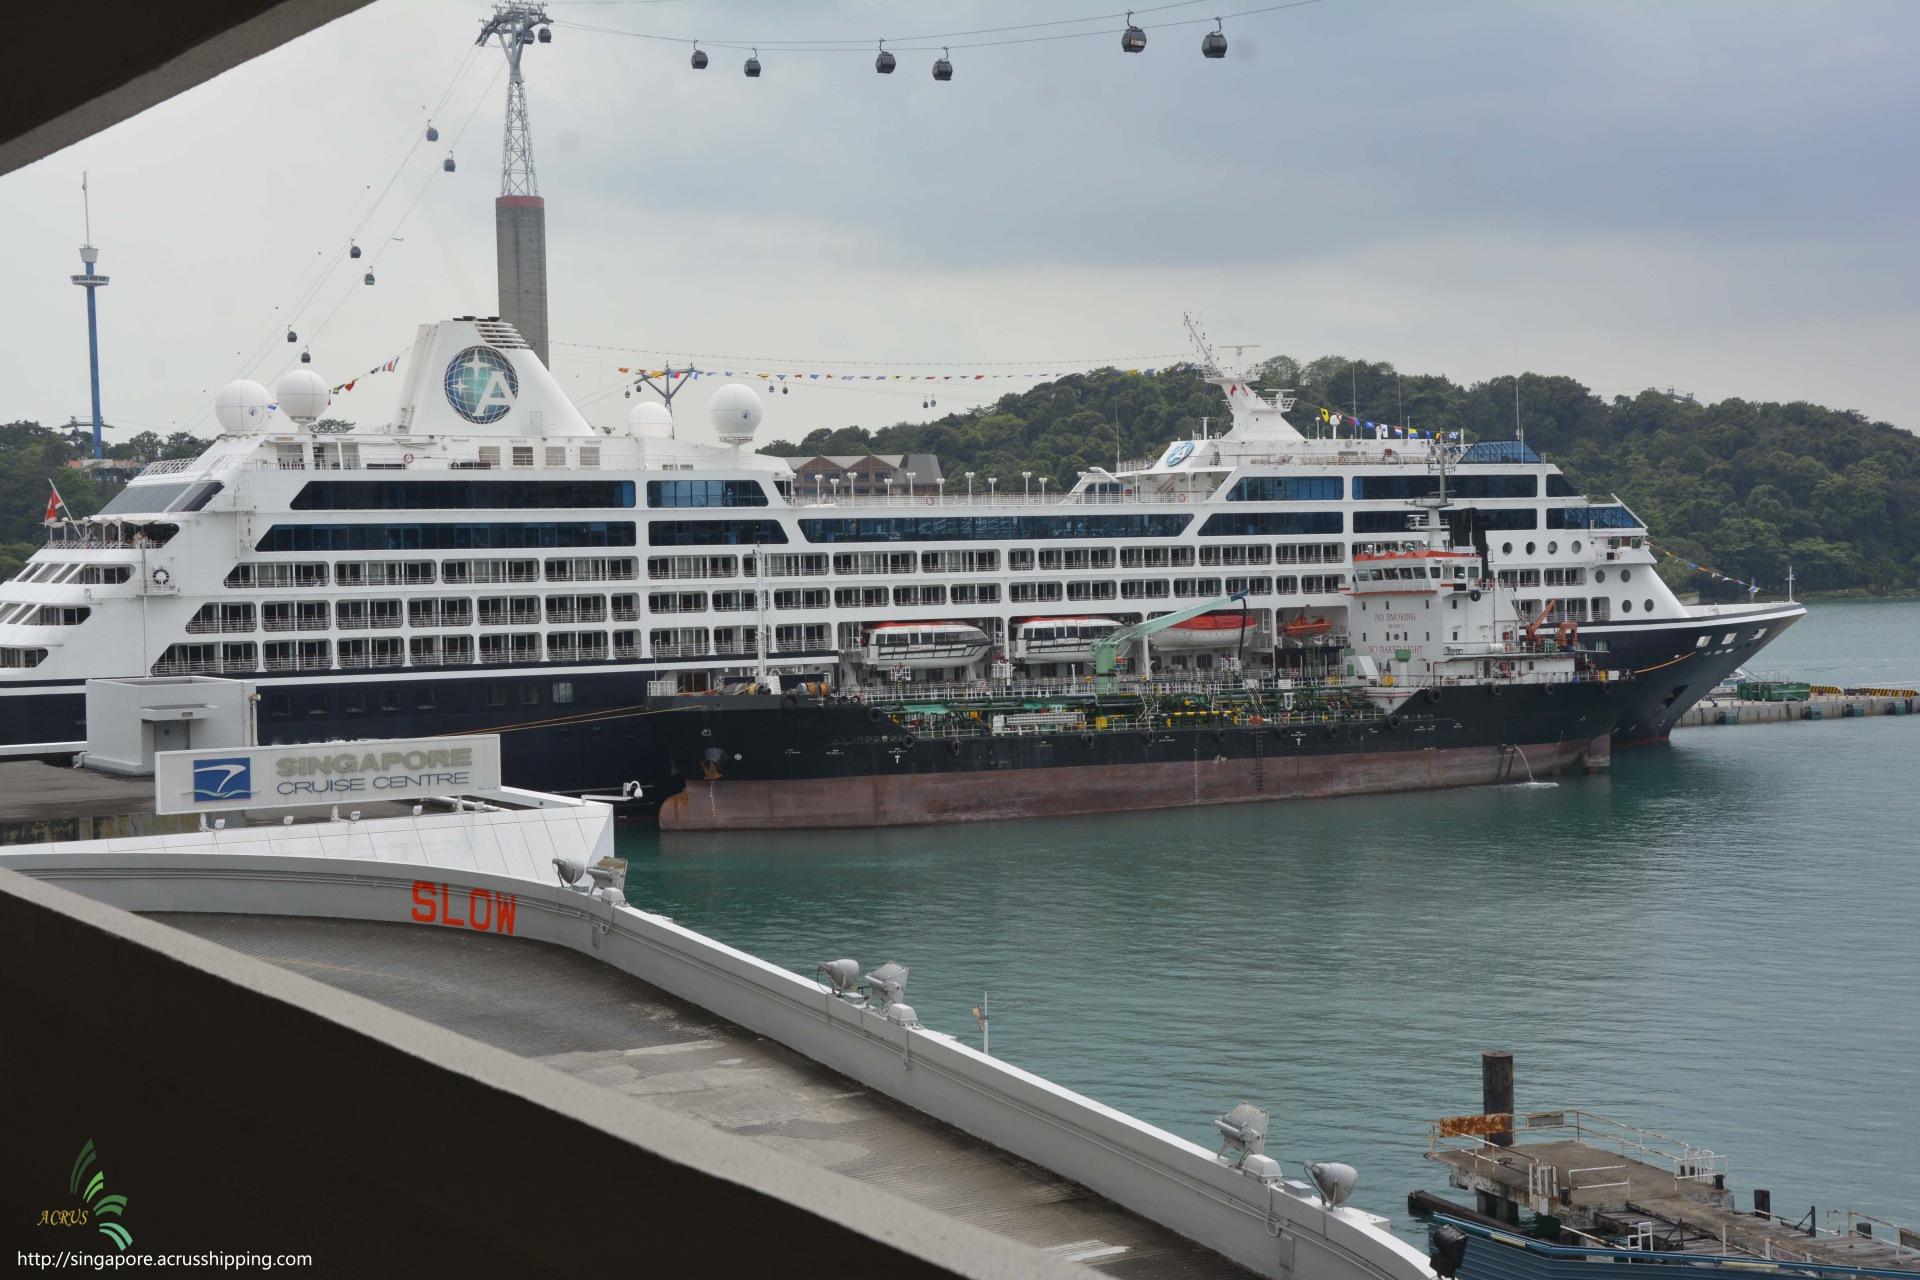 Gallery - Acrus Shipping(PTE) LTD - Singapore